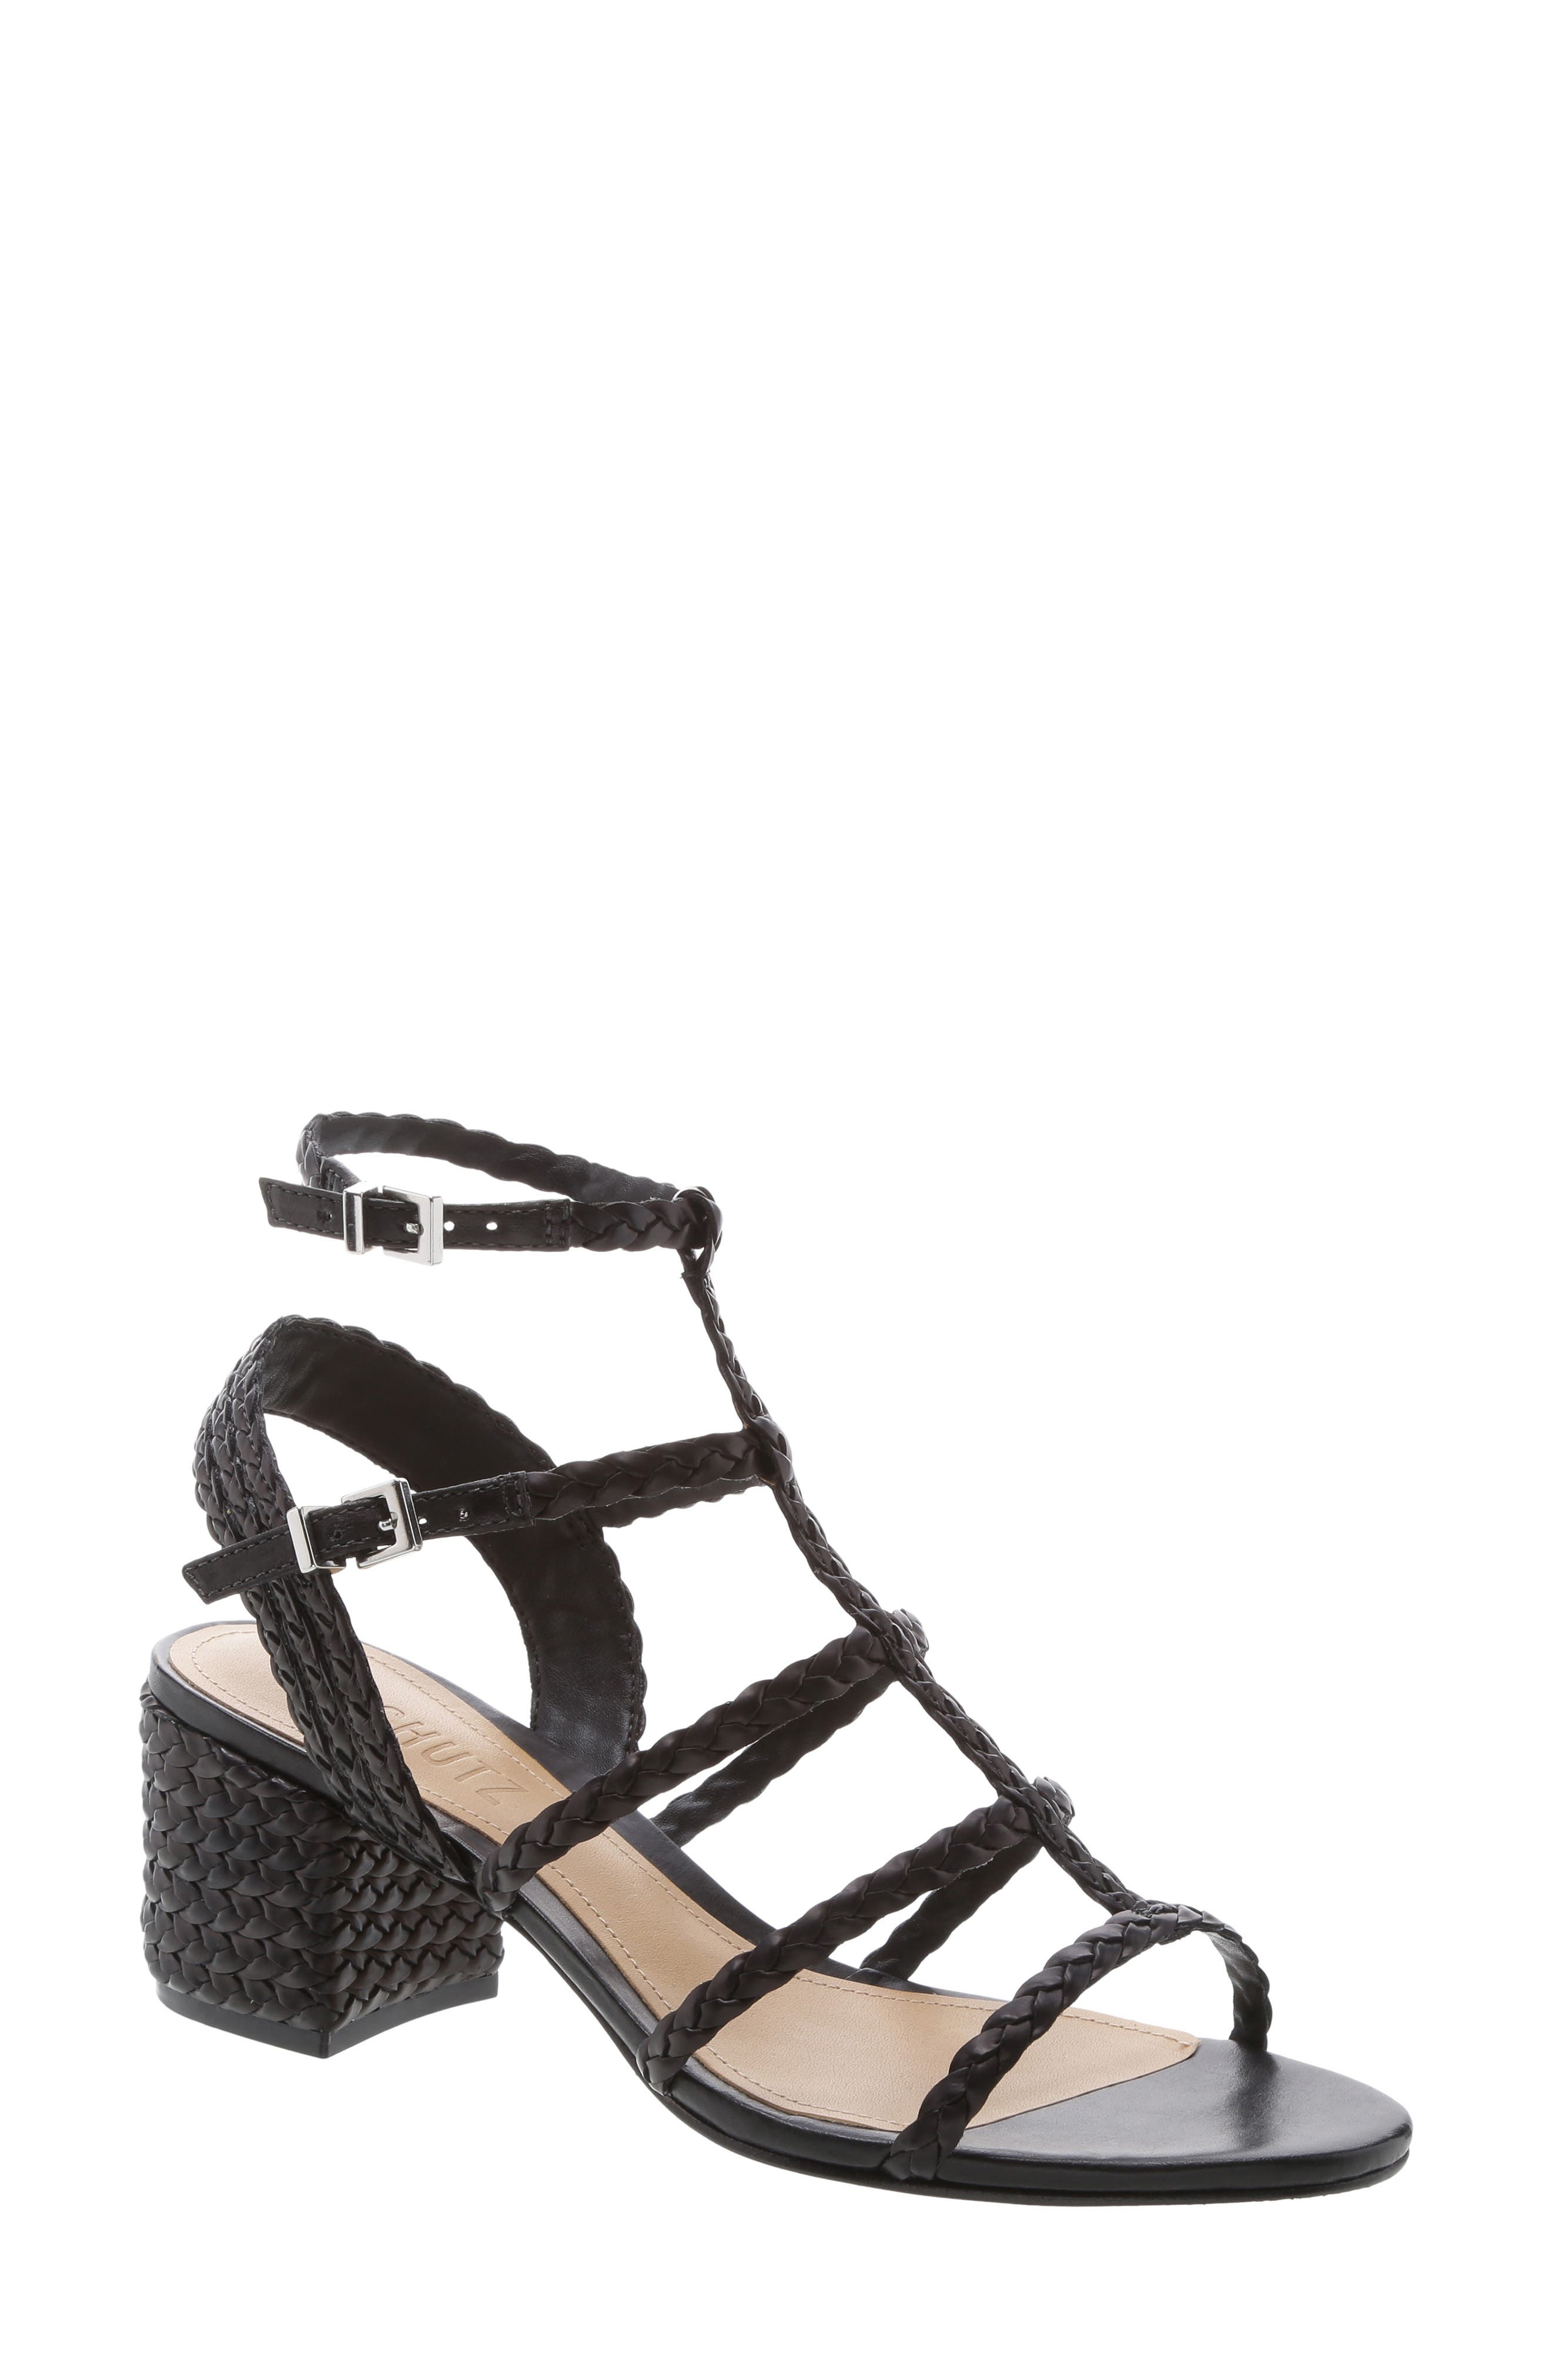 SCHUTZ, Rosalia Block Heel Sandal, Main thumbnail 1, color, BLACK LEATHER